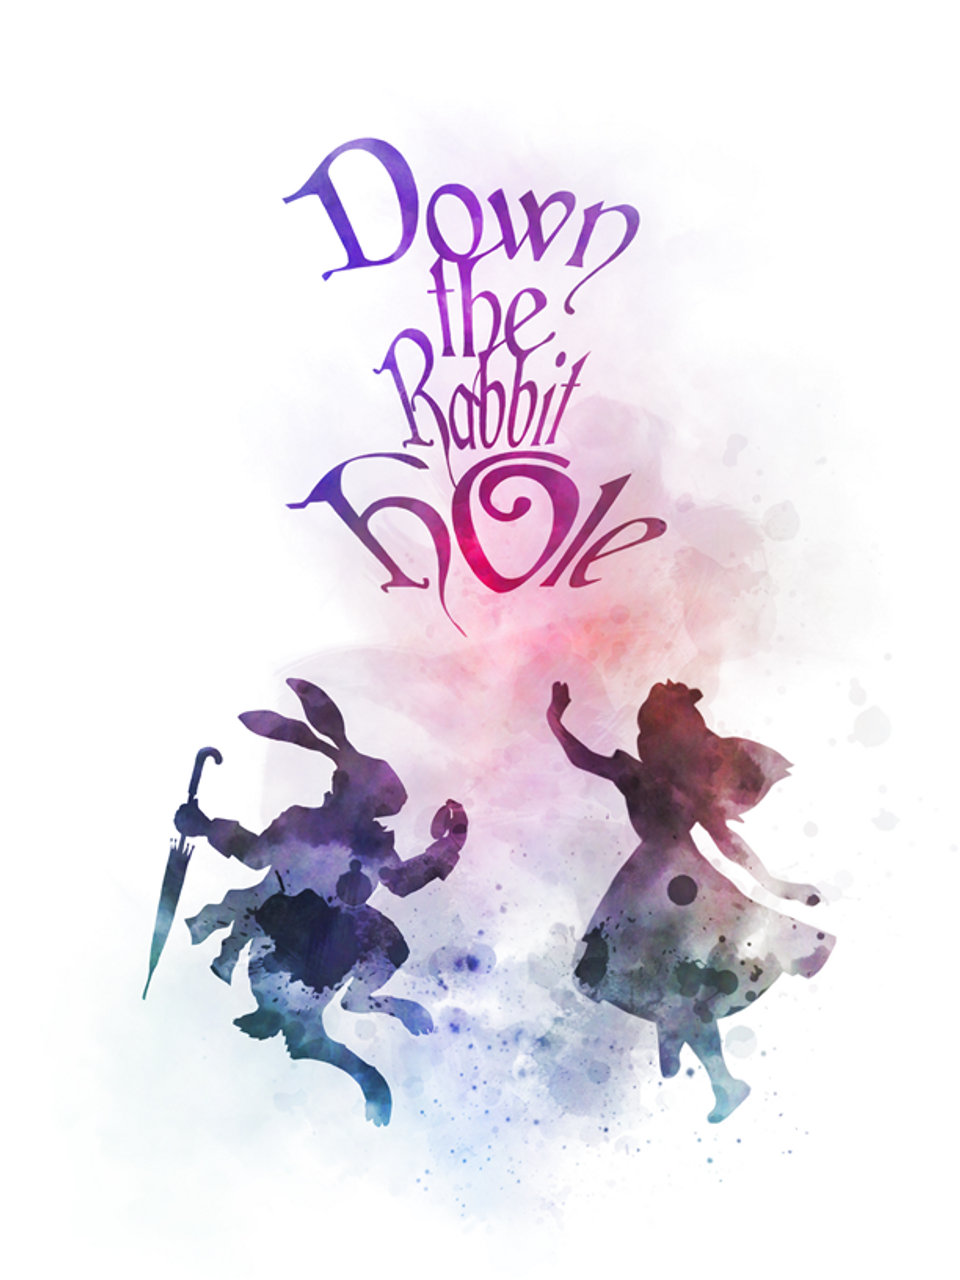 Art Prints Art Art Print Alice In Wonderland Mad Hatter Quote Illustration Wall Art B W Zsco Iq